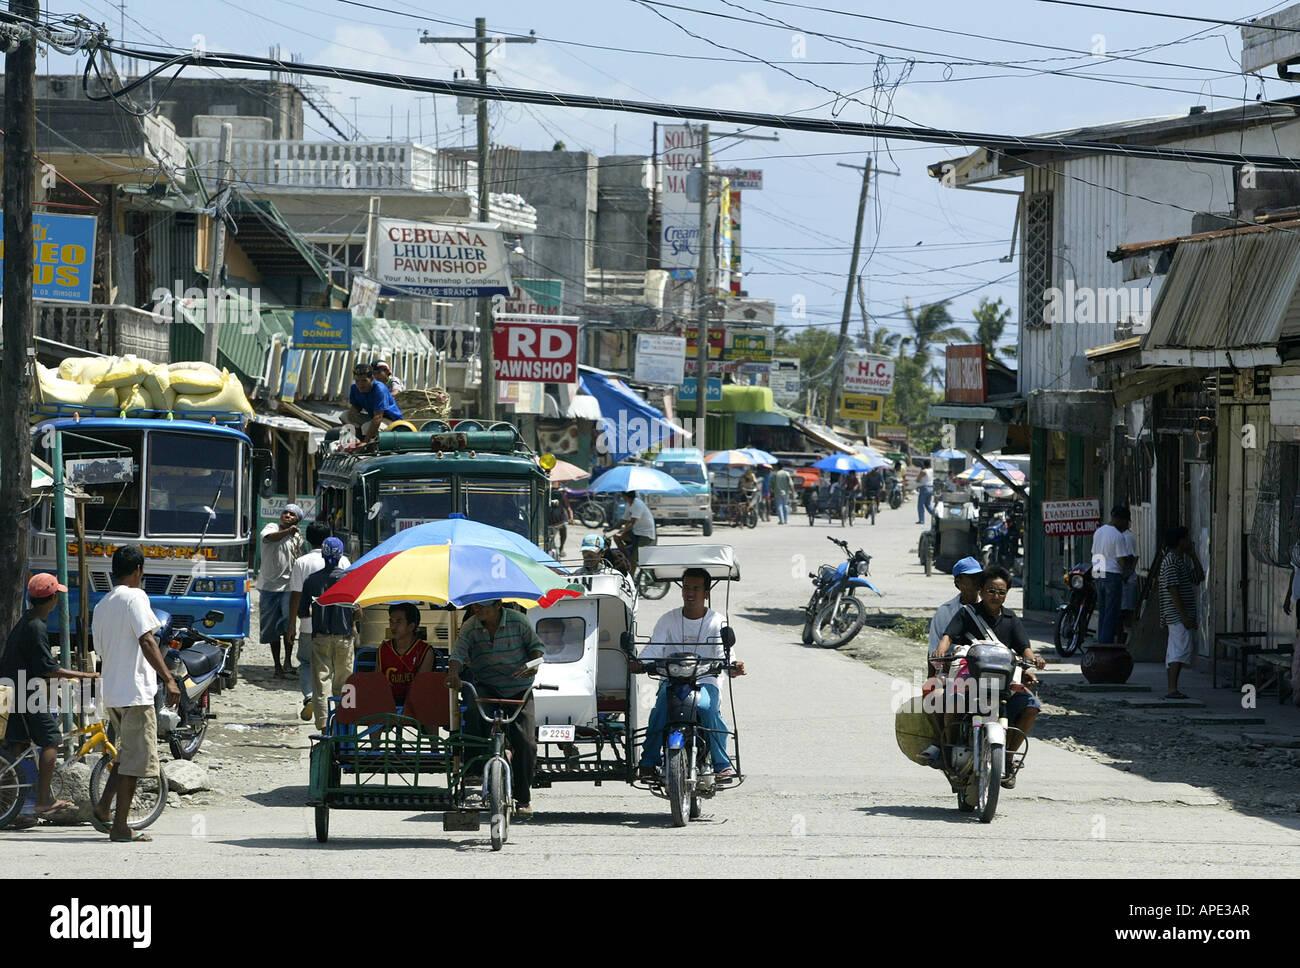 Street scene in Roxas, Oriental Mindoro, Philippines. Stock Photo